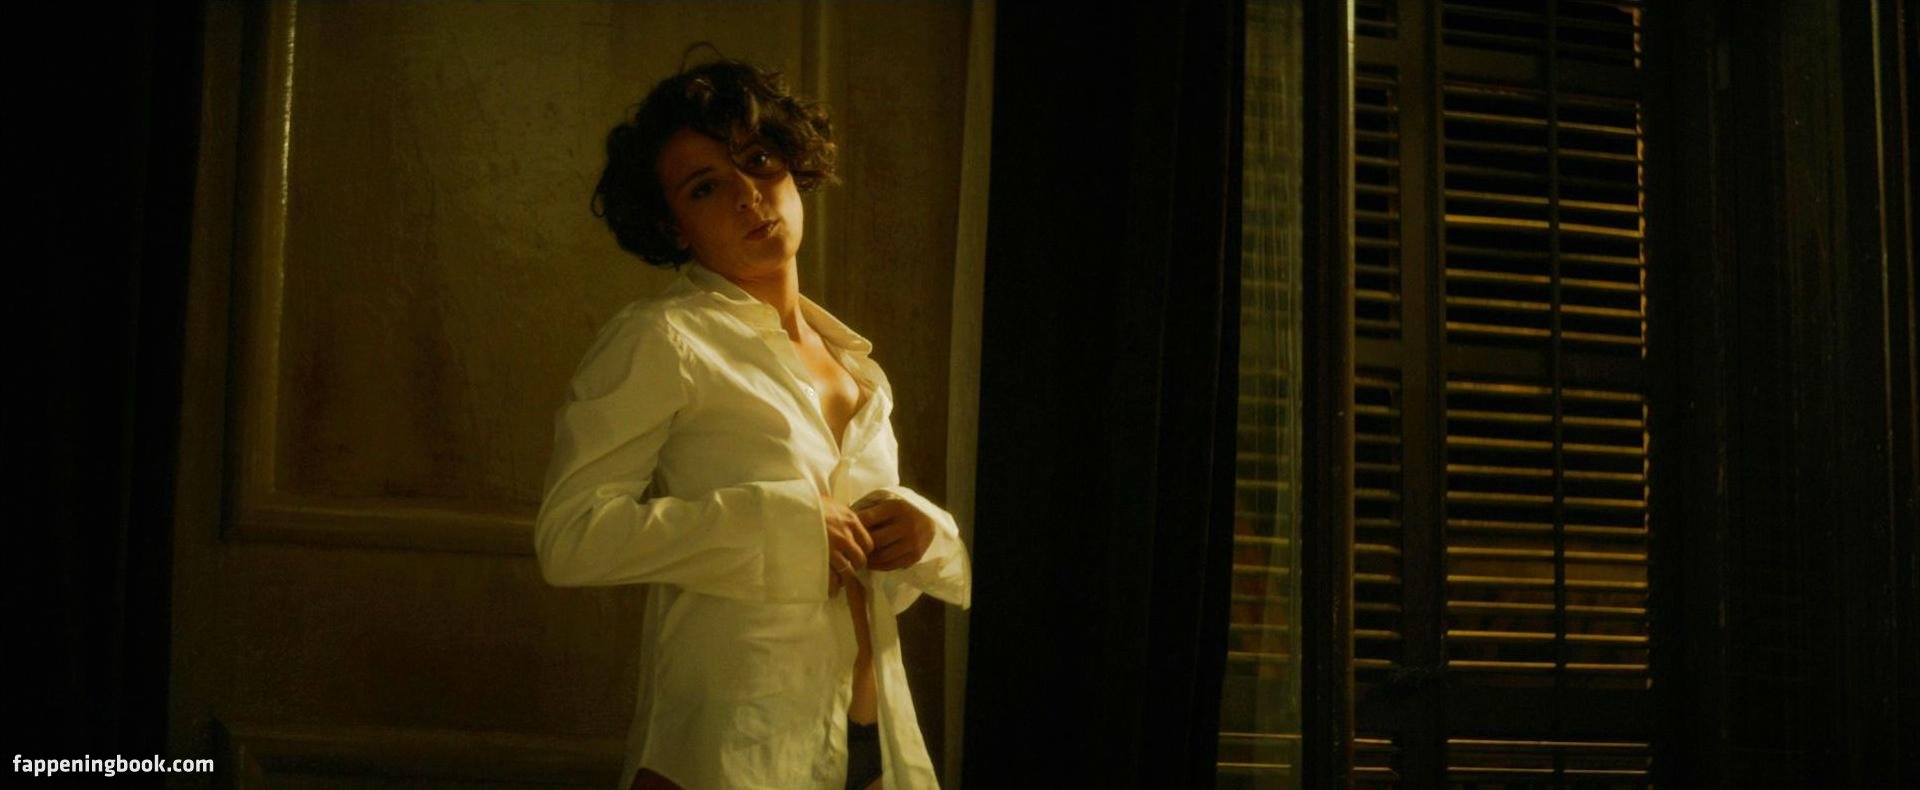 Jasmine Trinca Nude, Sexy, The Fappening, Uncensored